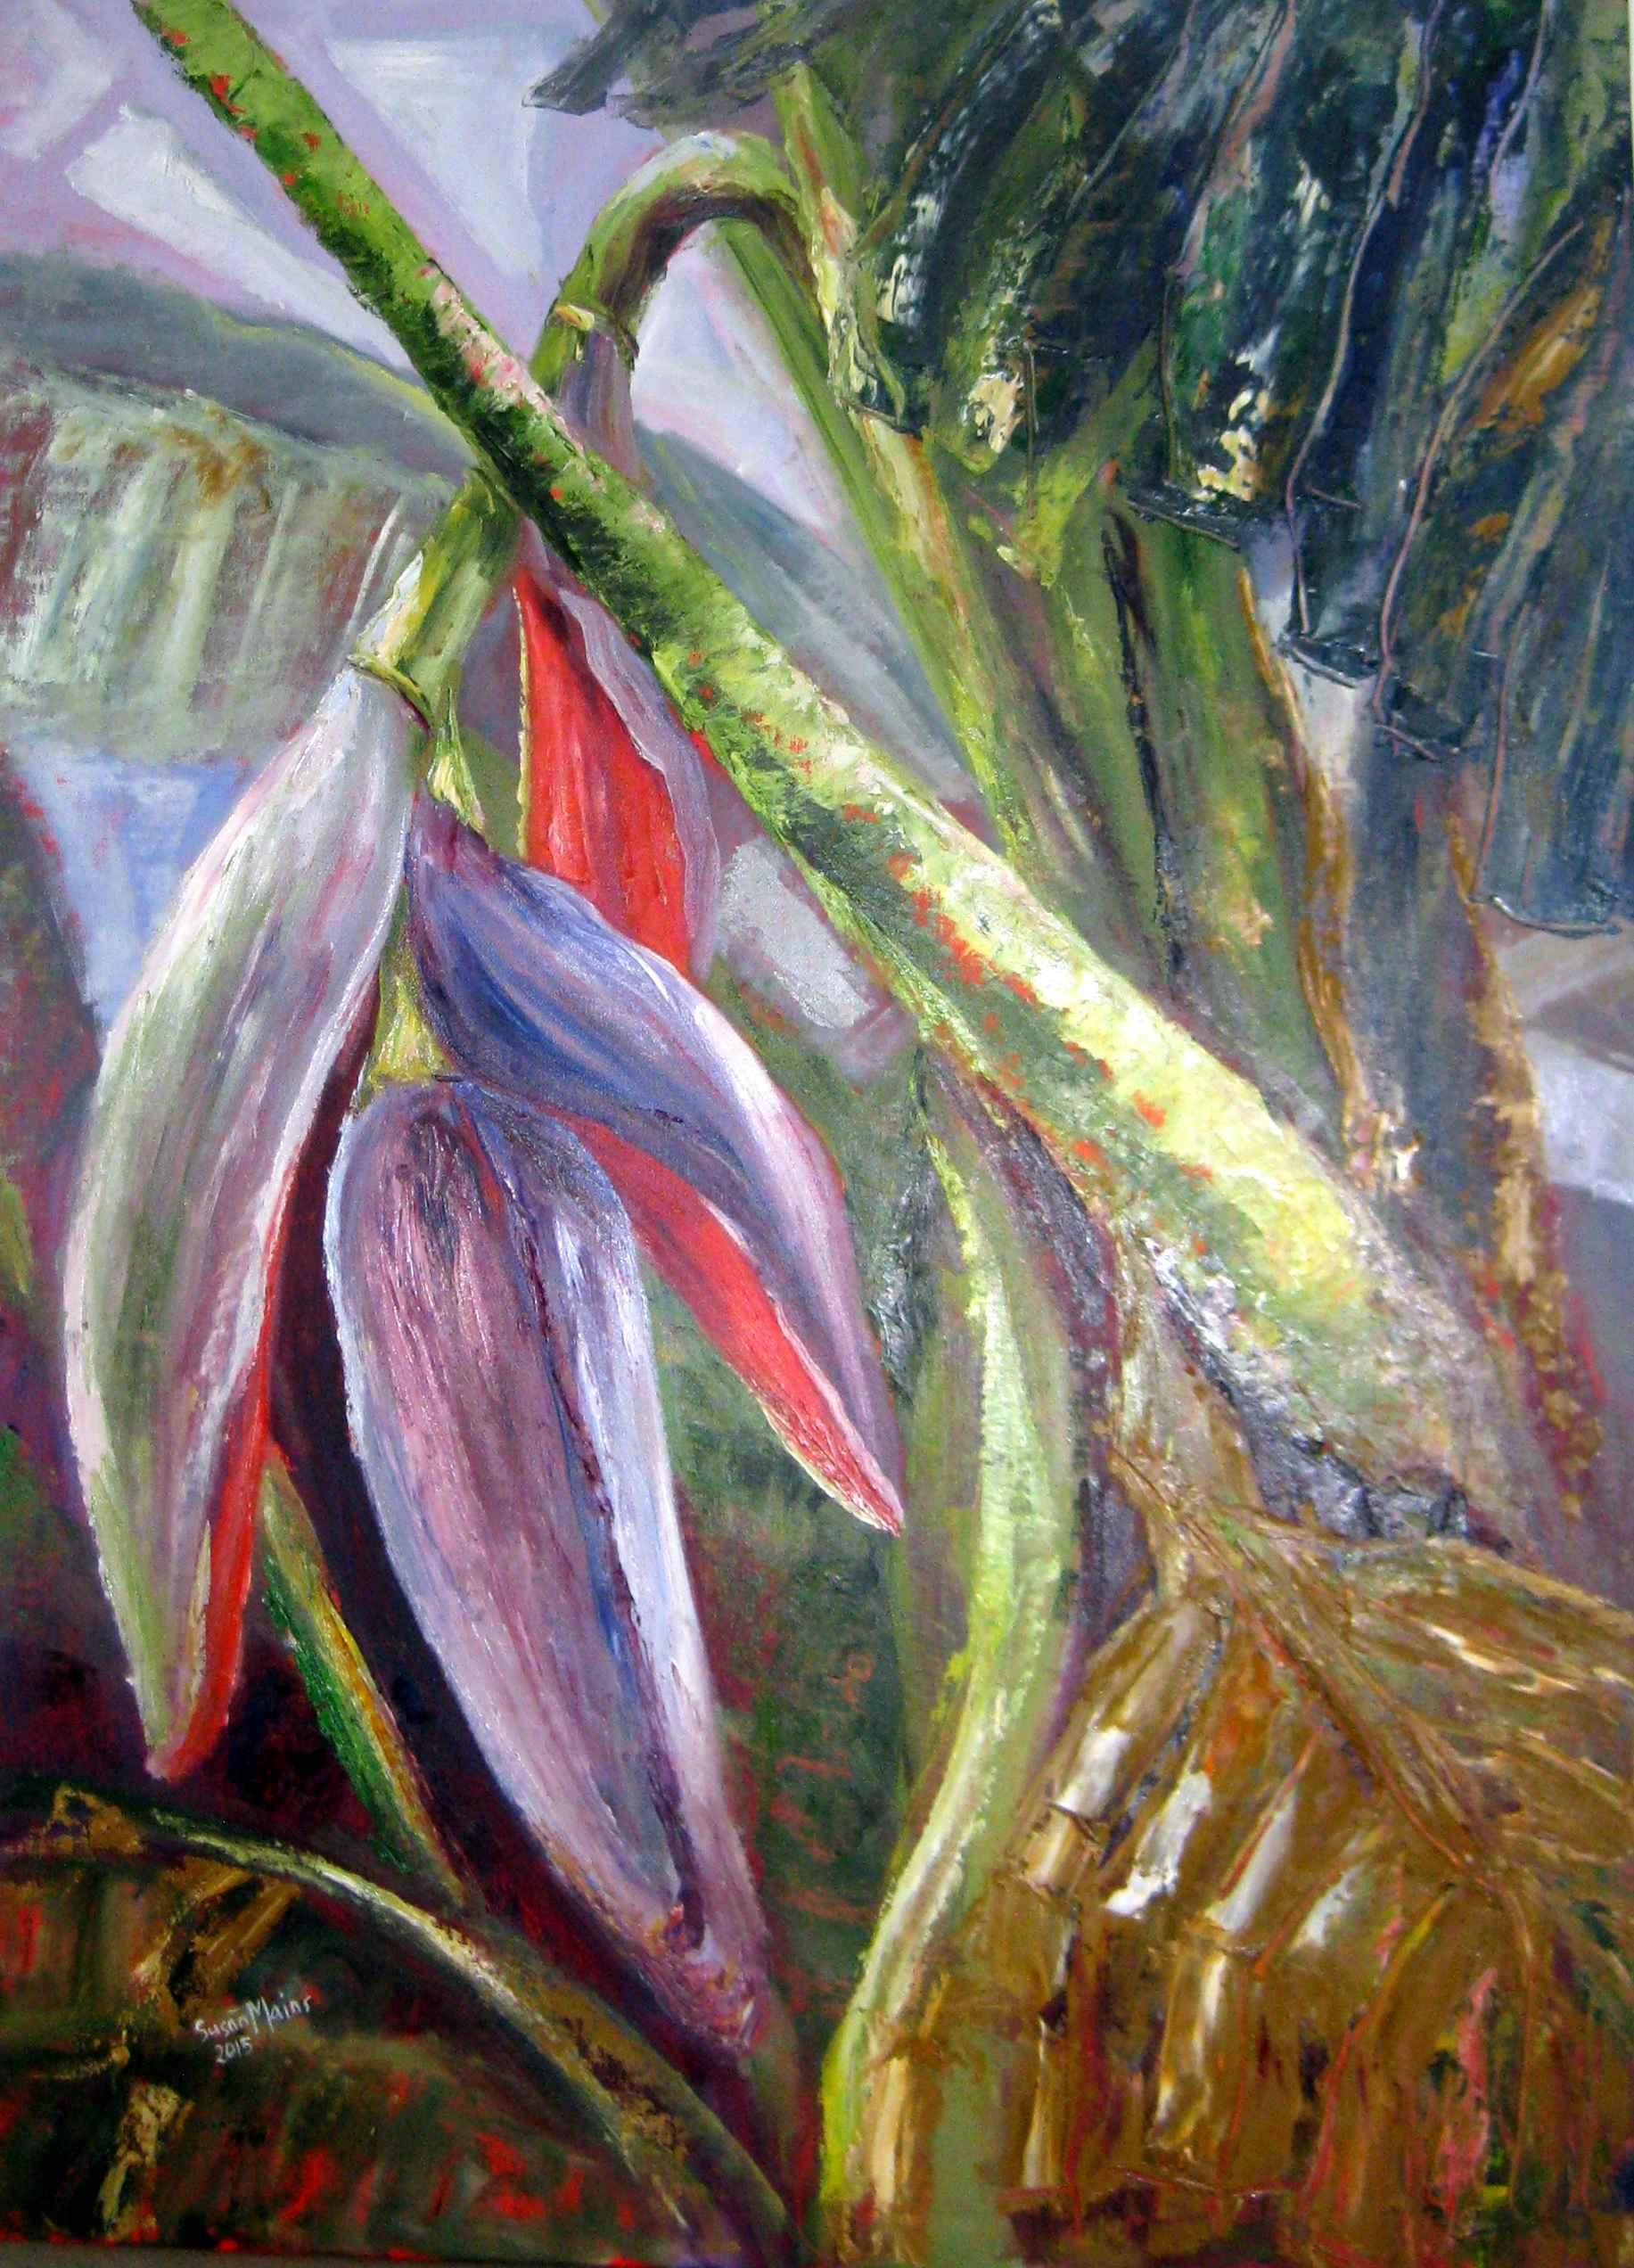 Banana Flower in Viol... by Mrs. Susan Mains - Masterpiece Online